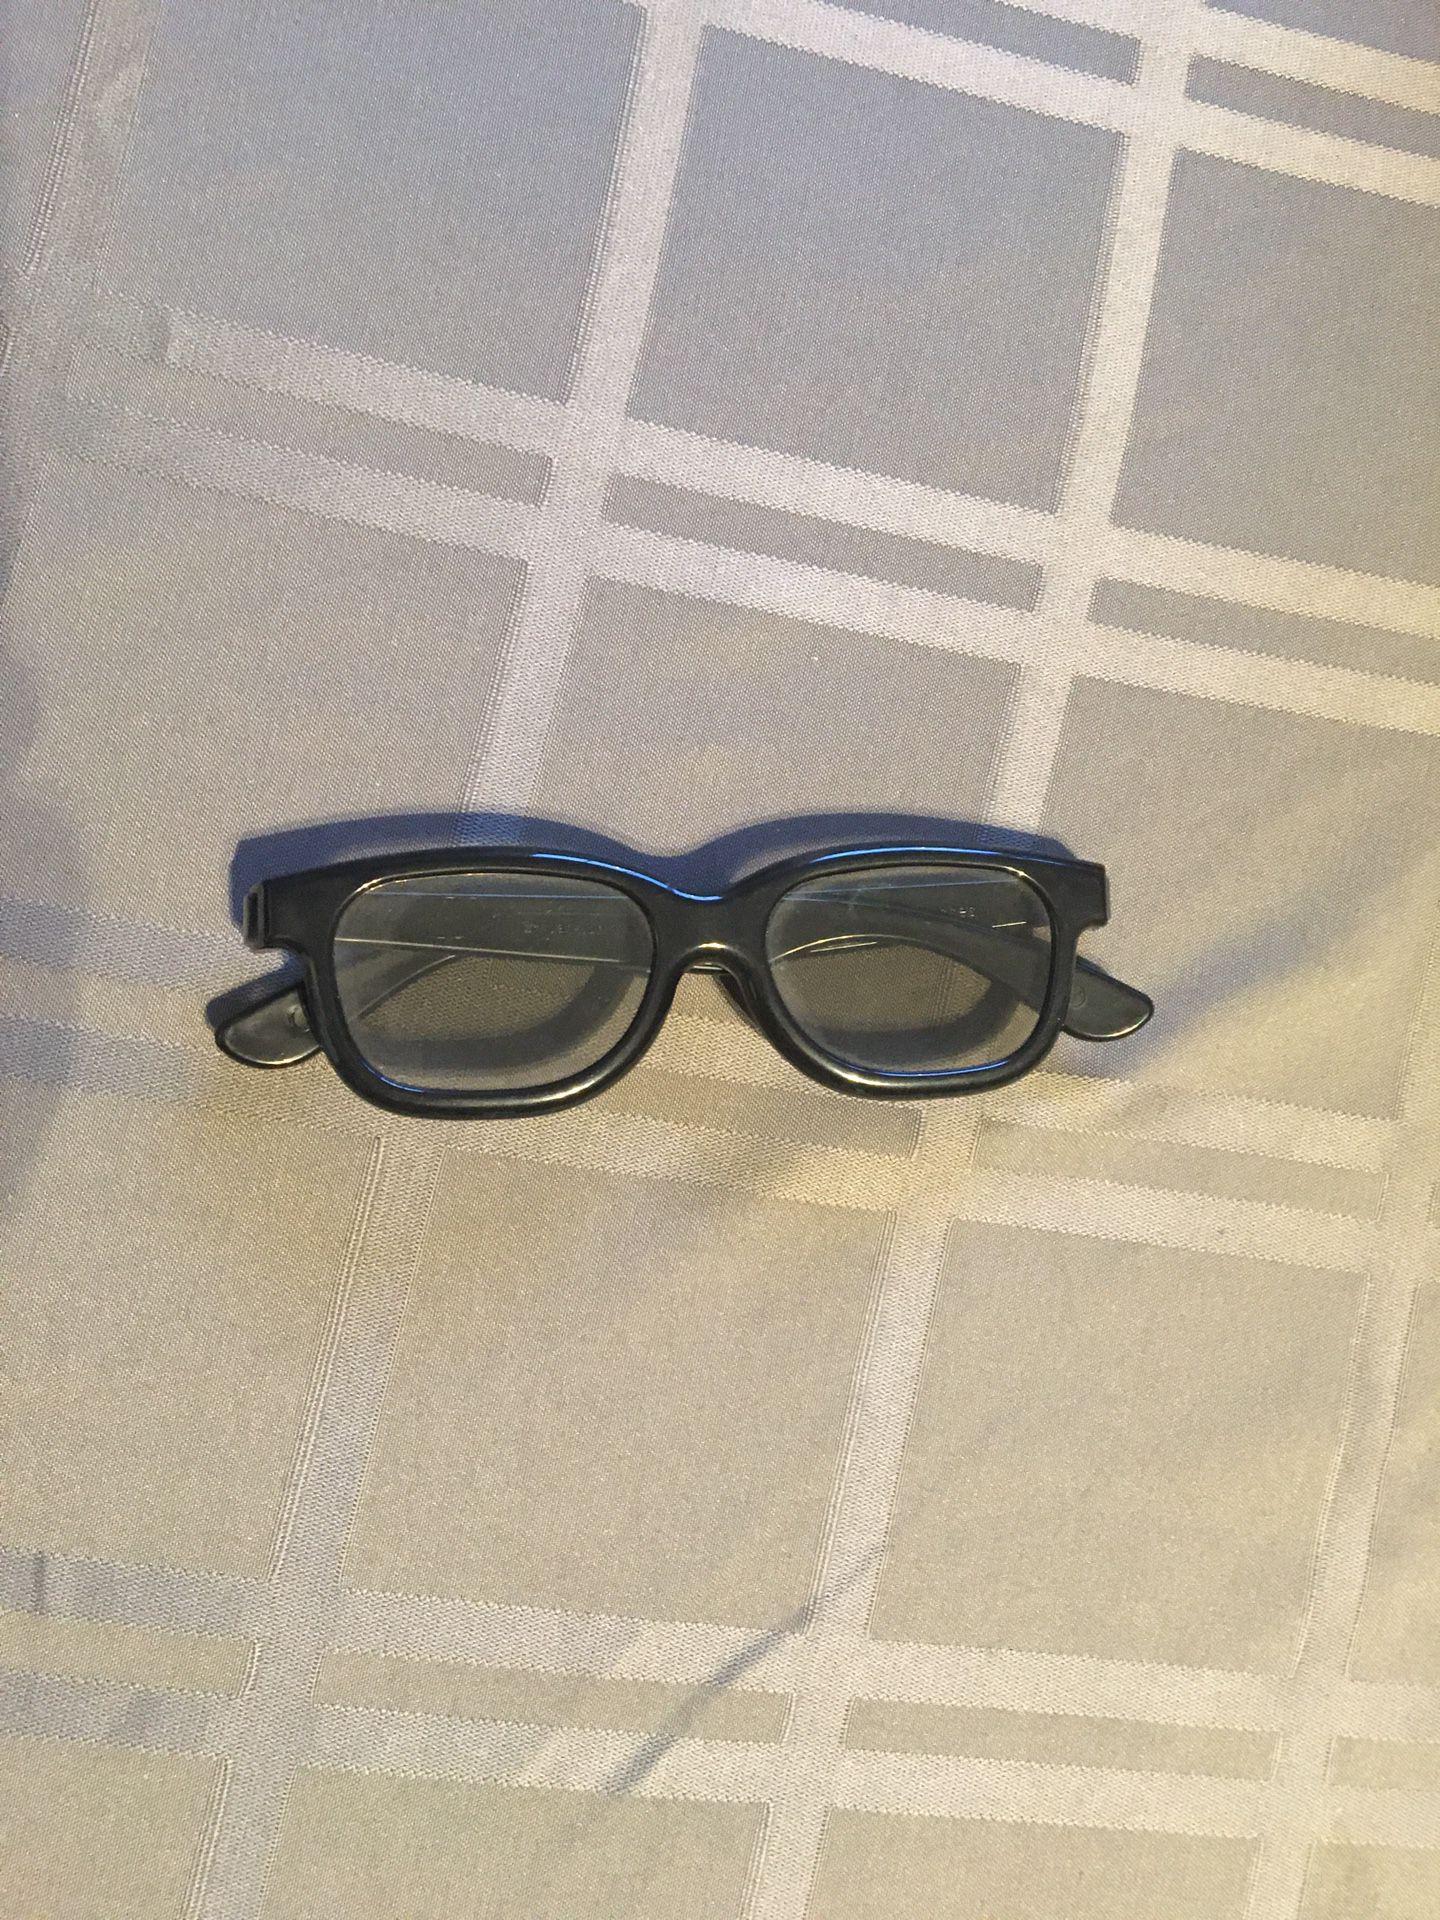 3D Glasses (7 total)